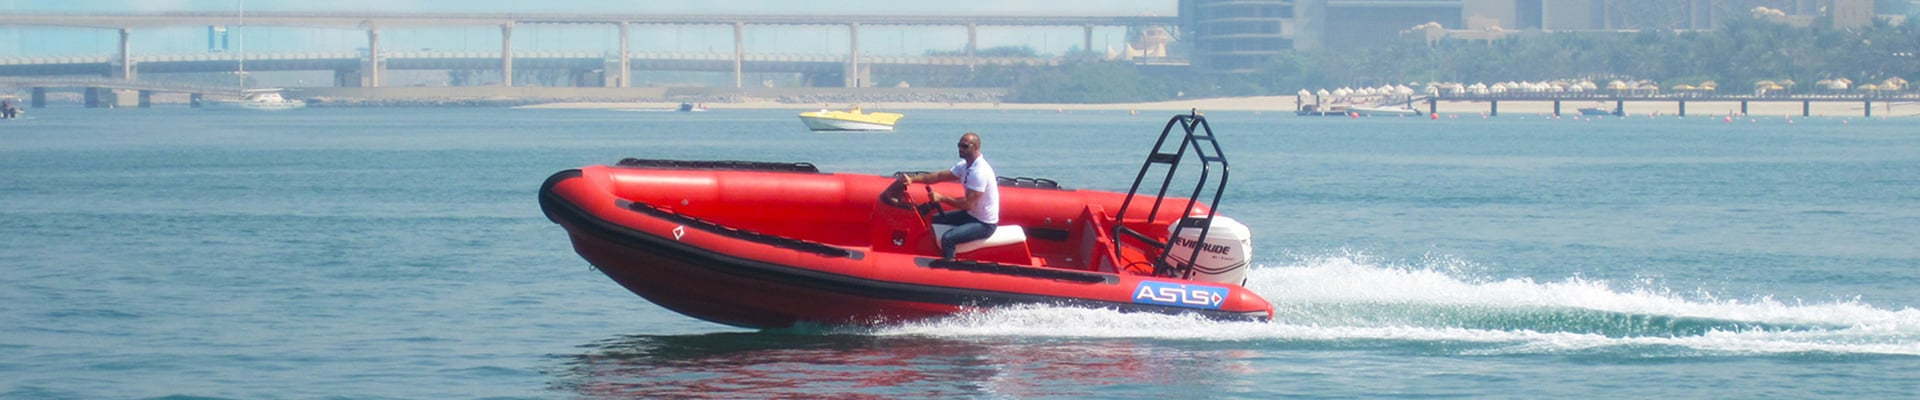 outboard-oil-gas-rib-boats